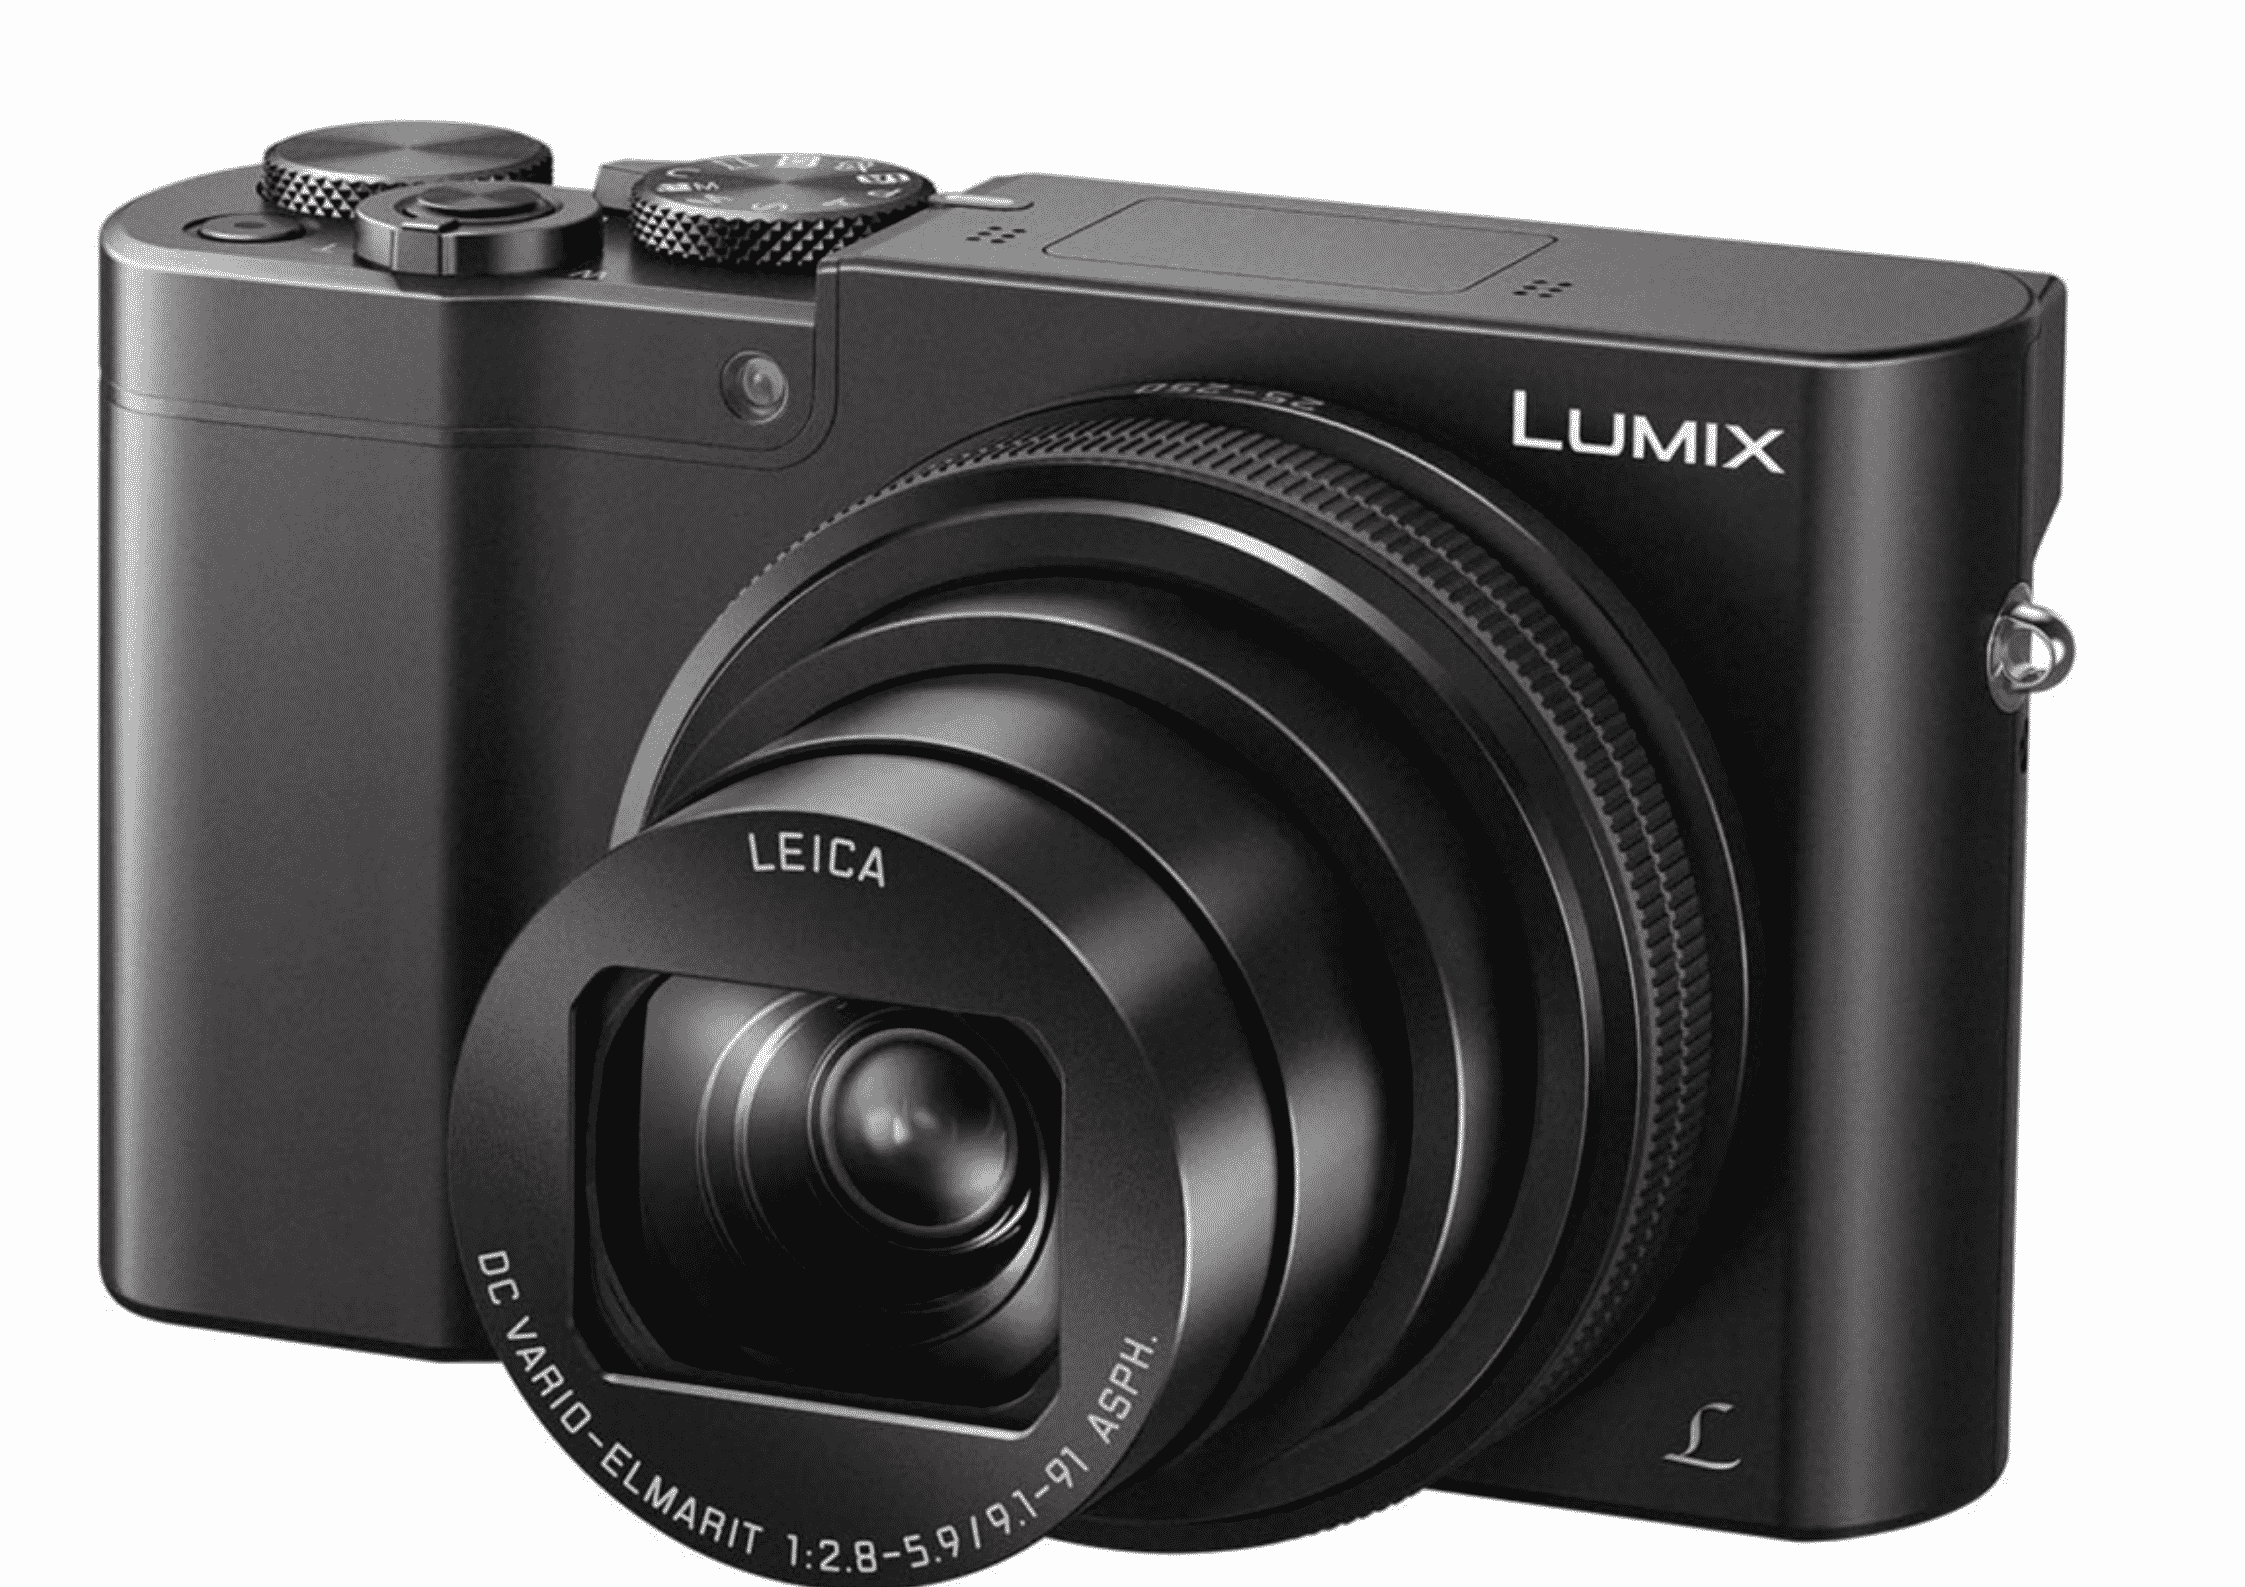 Panasonic Lumix - Best compact camera for beginners